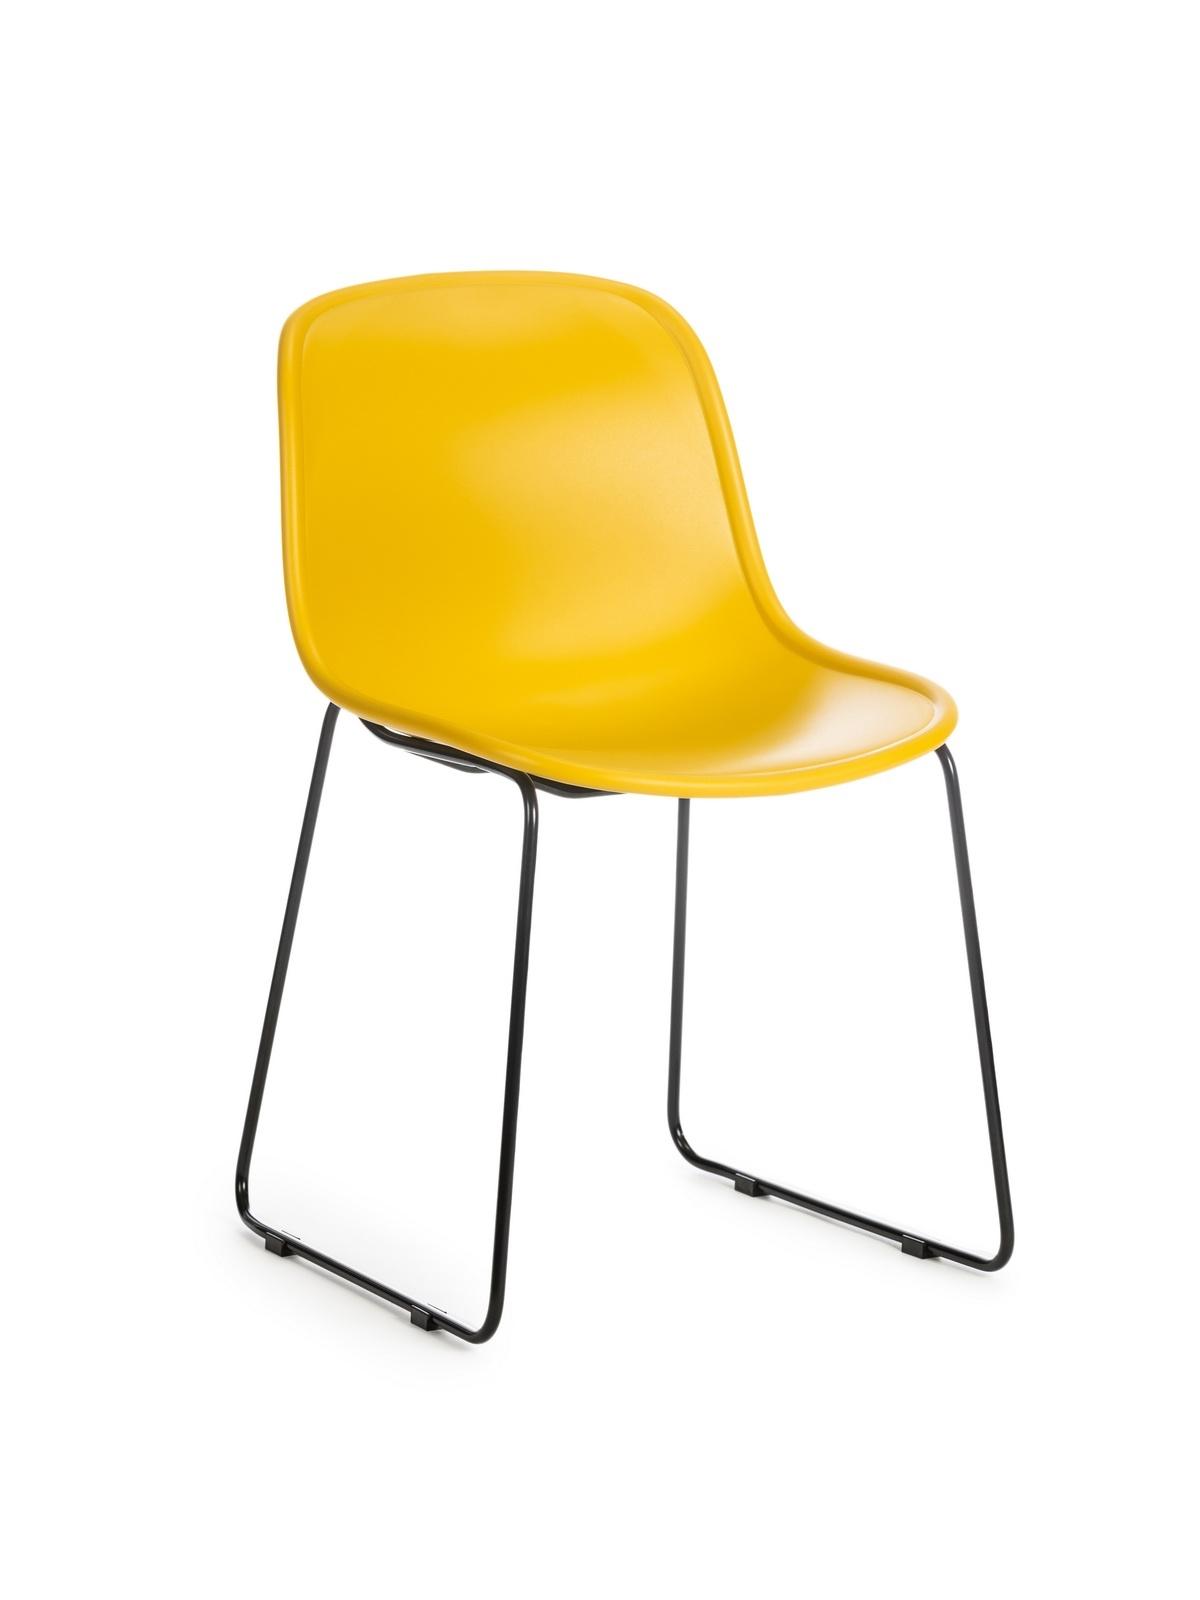 Scaun din plastic, cu picioare metalice Cosmo Yellow, l57xA54xH78cm imagine